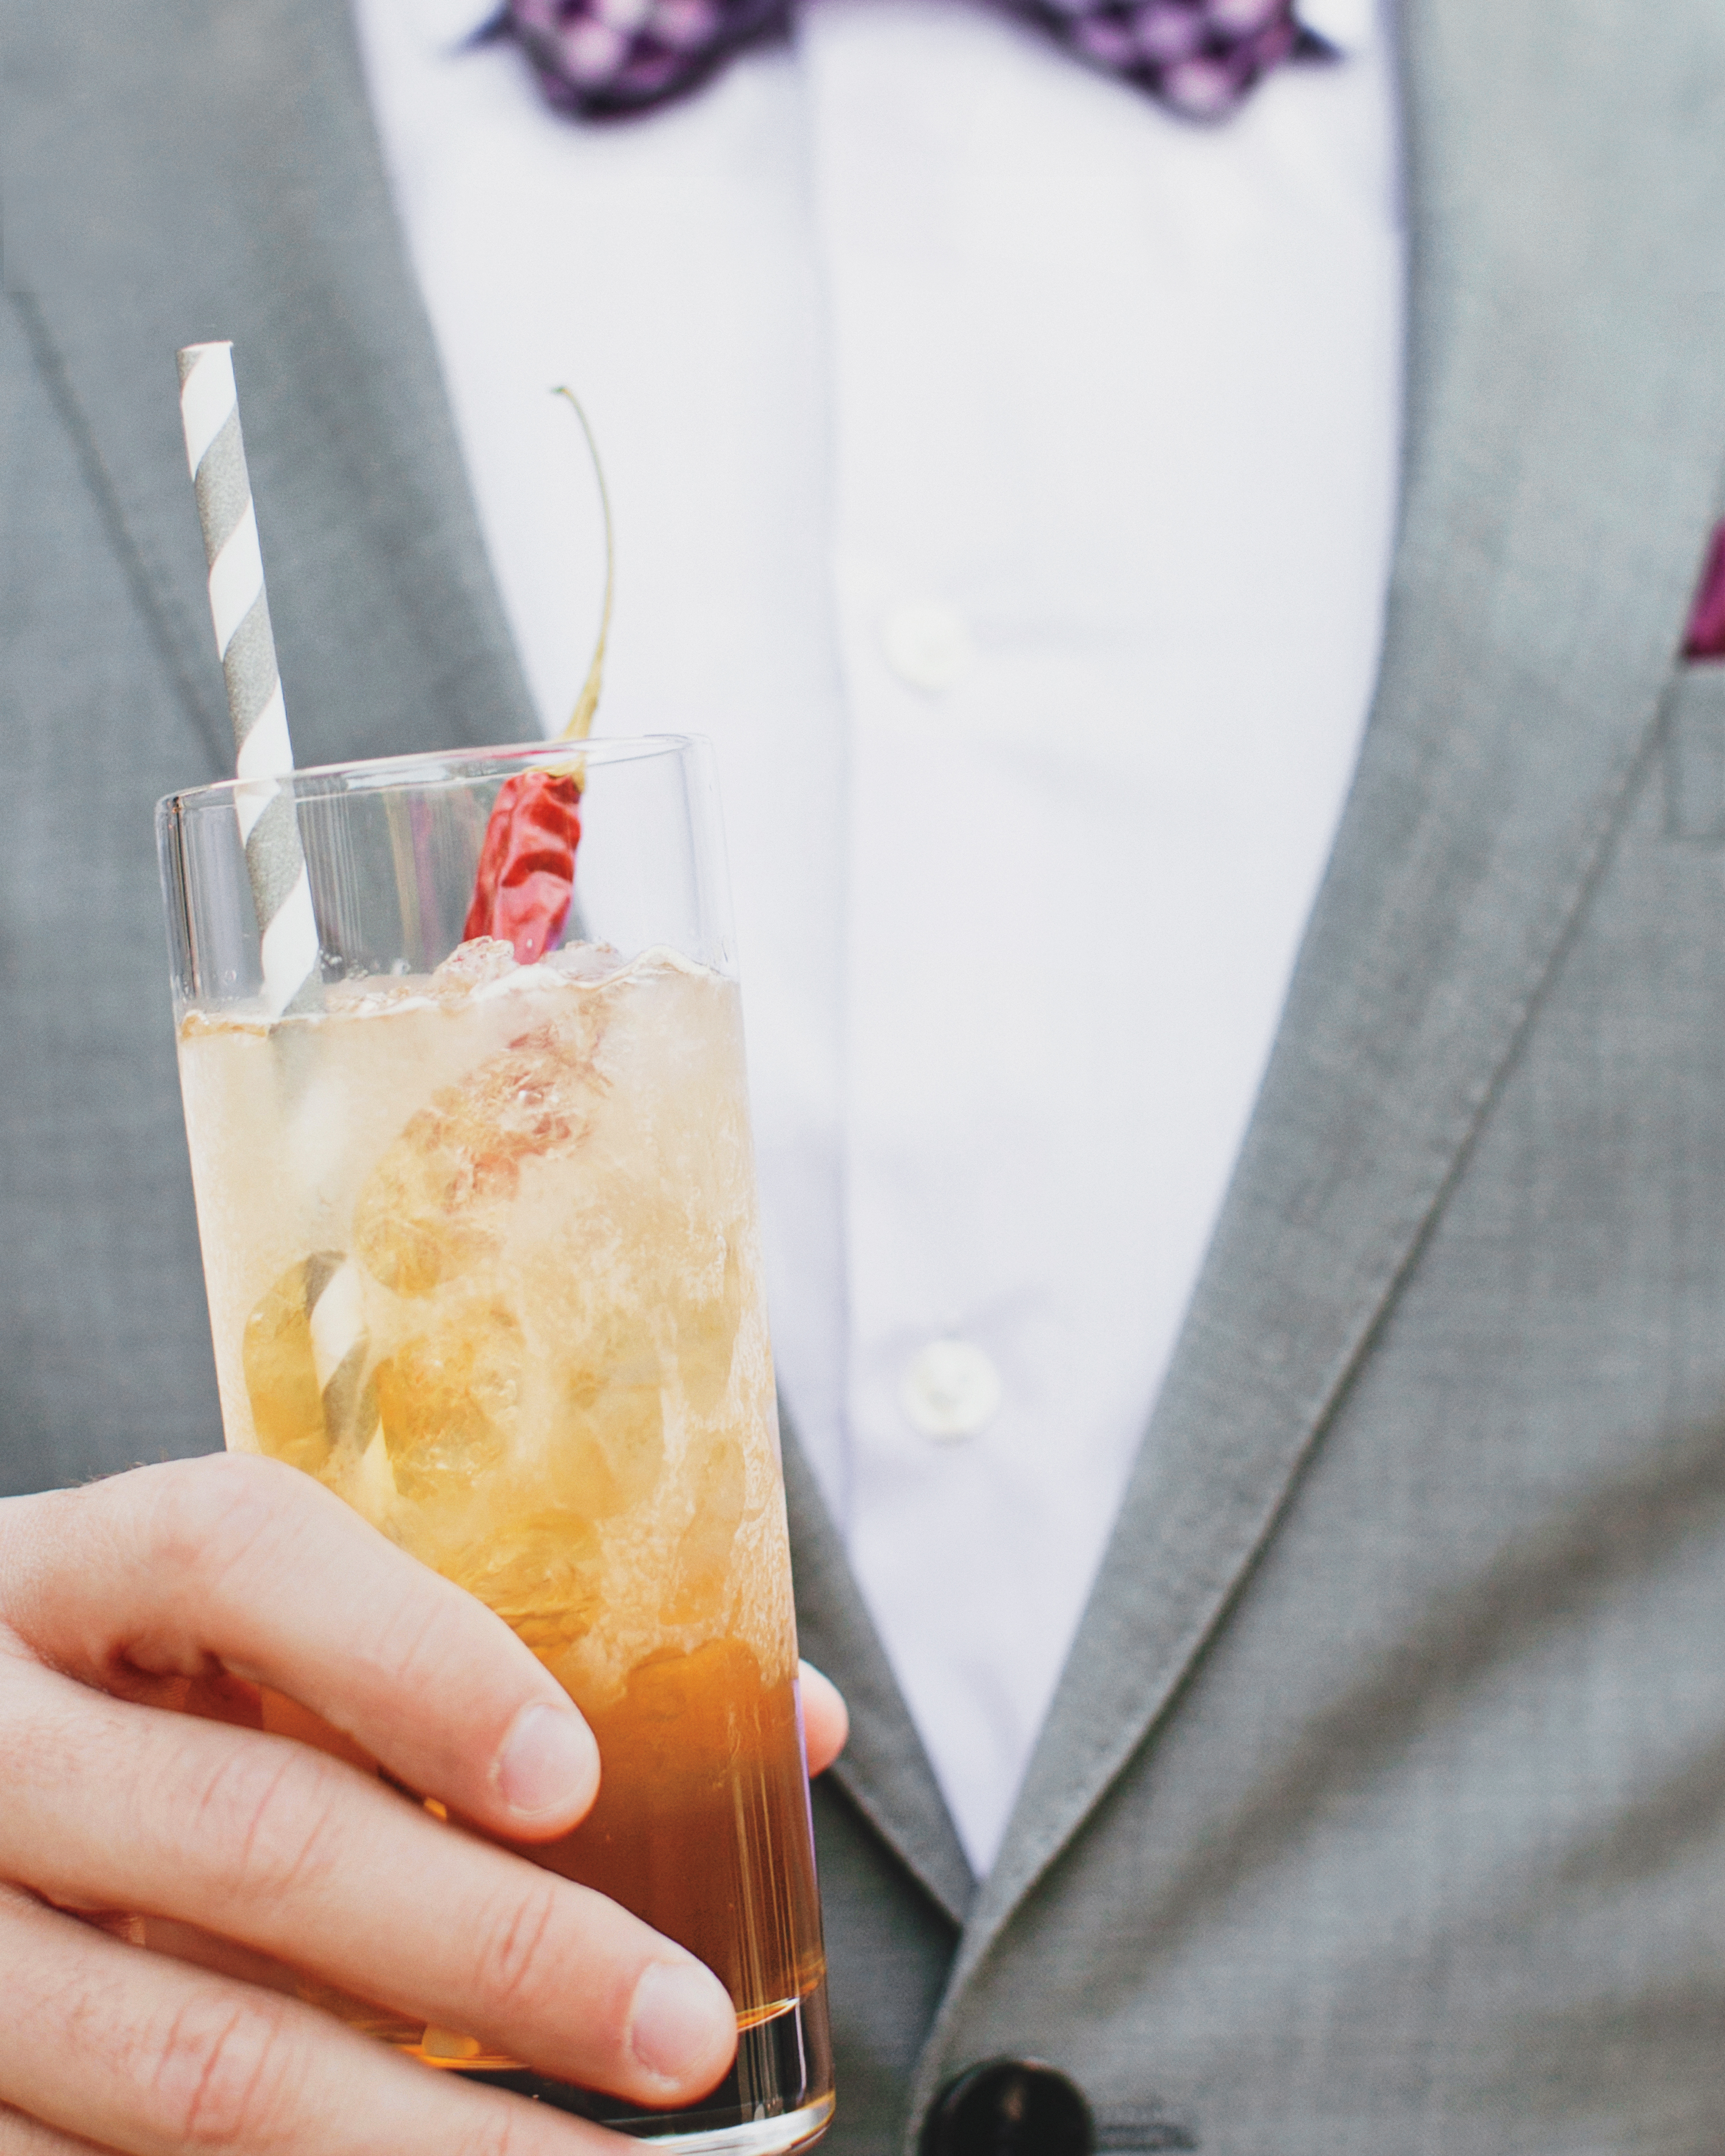 cacee-donald-drinks-comp-mwds110101.jpg